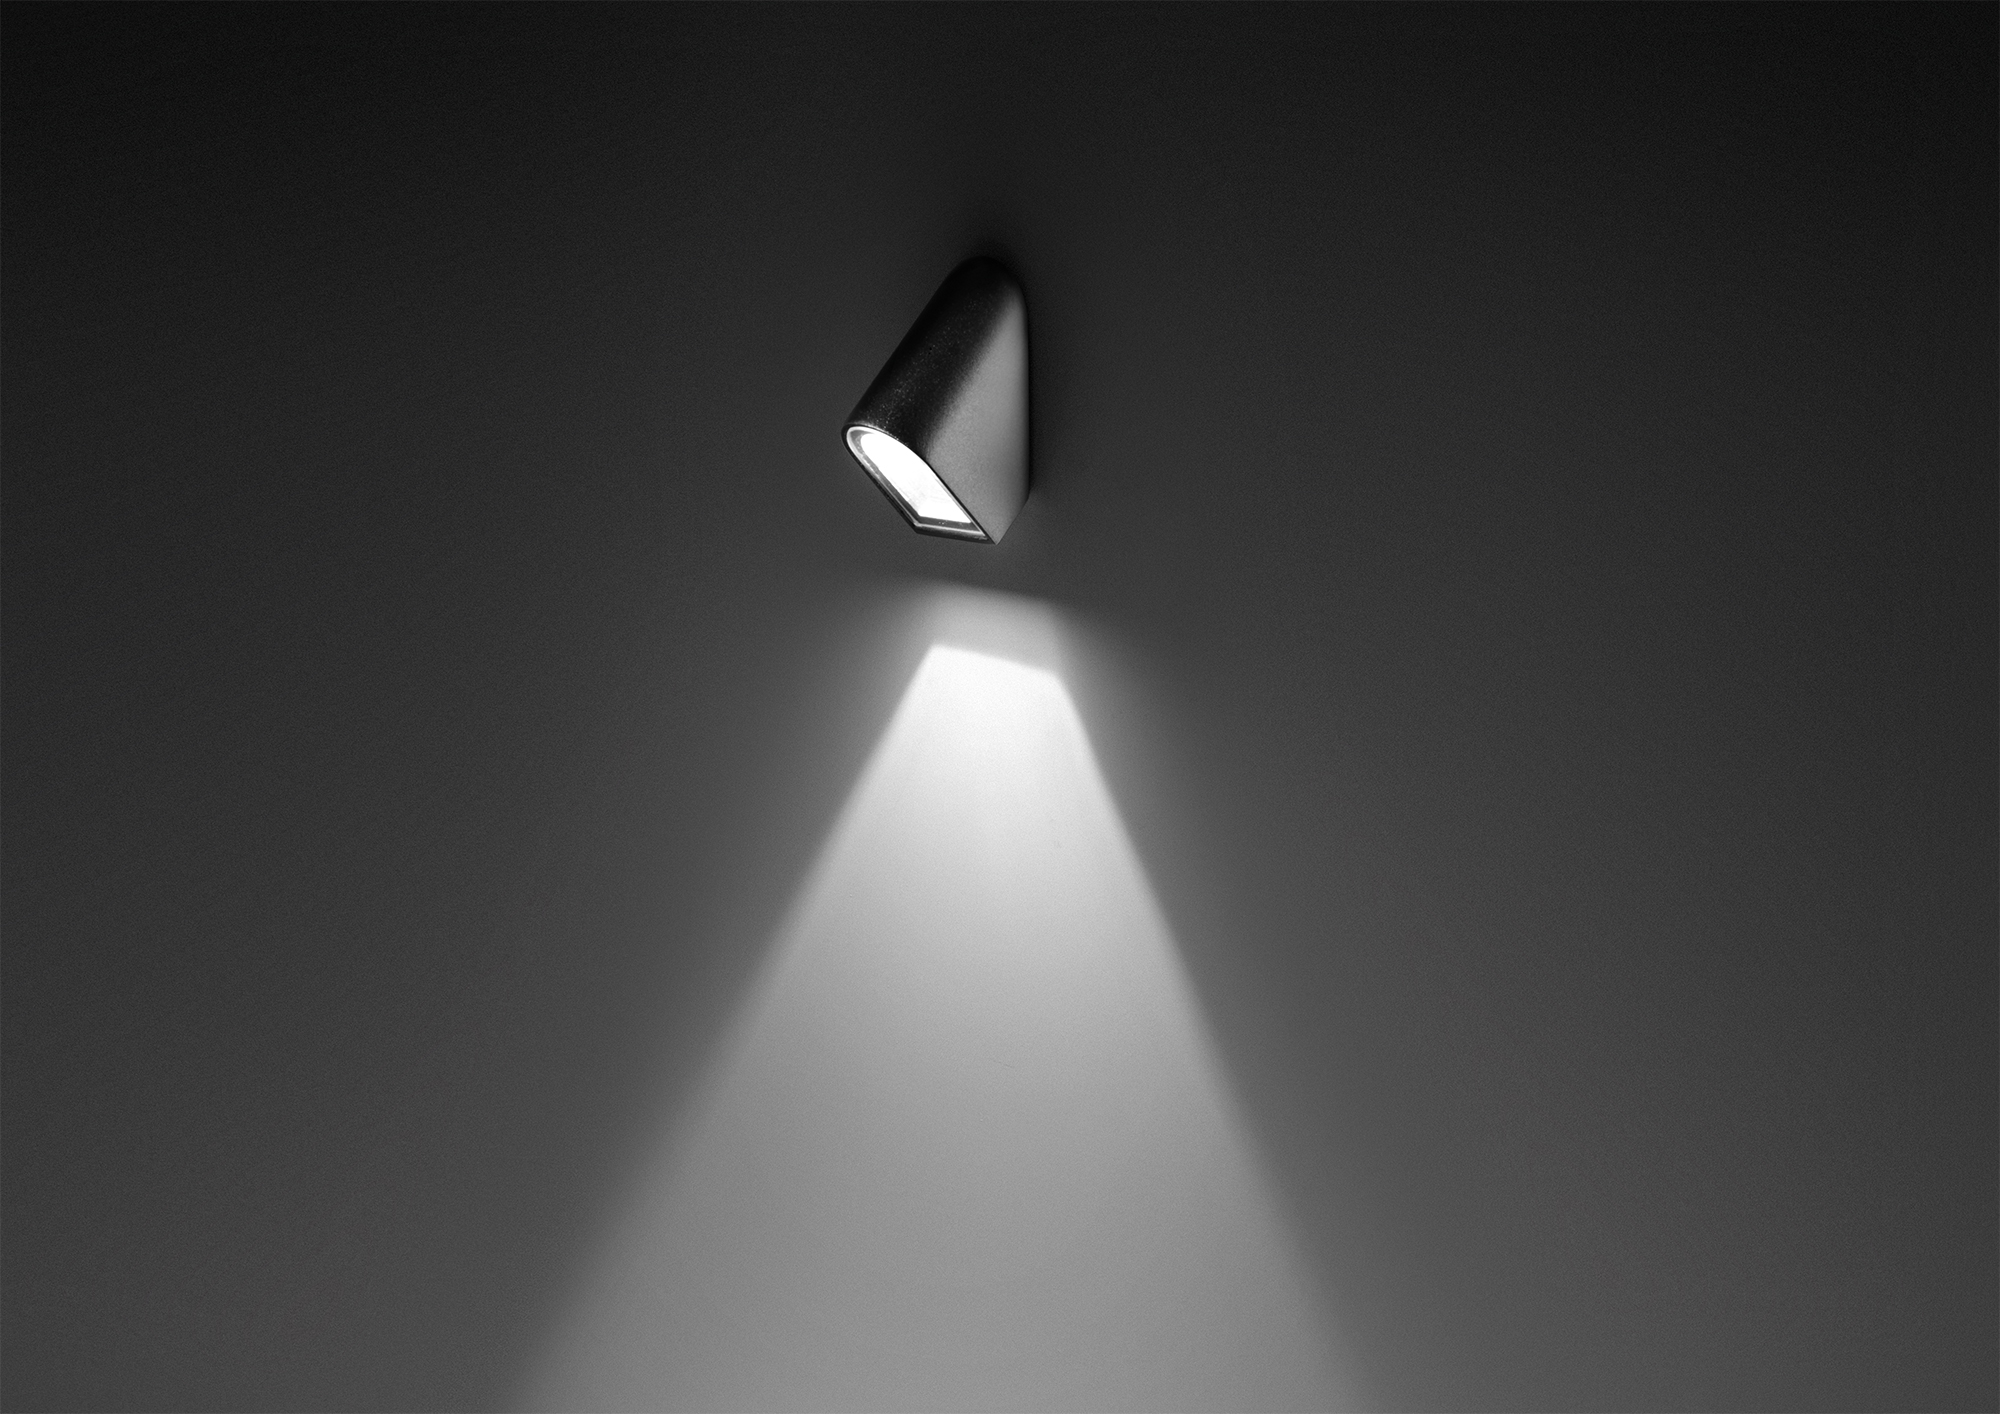 PETIT_Simes_outdoor light